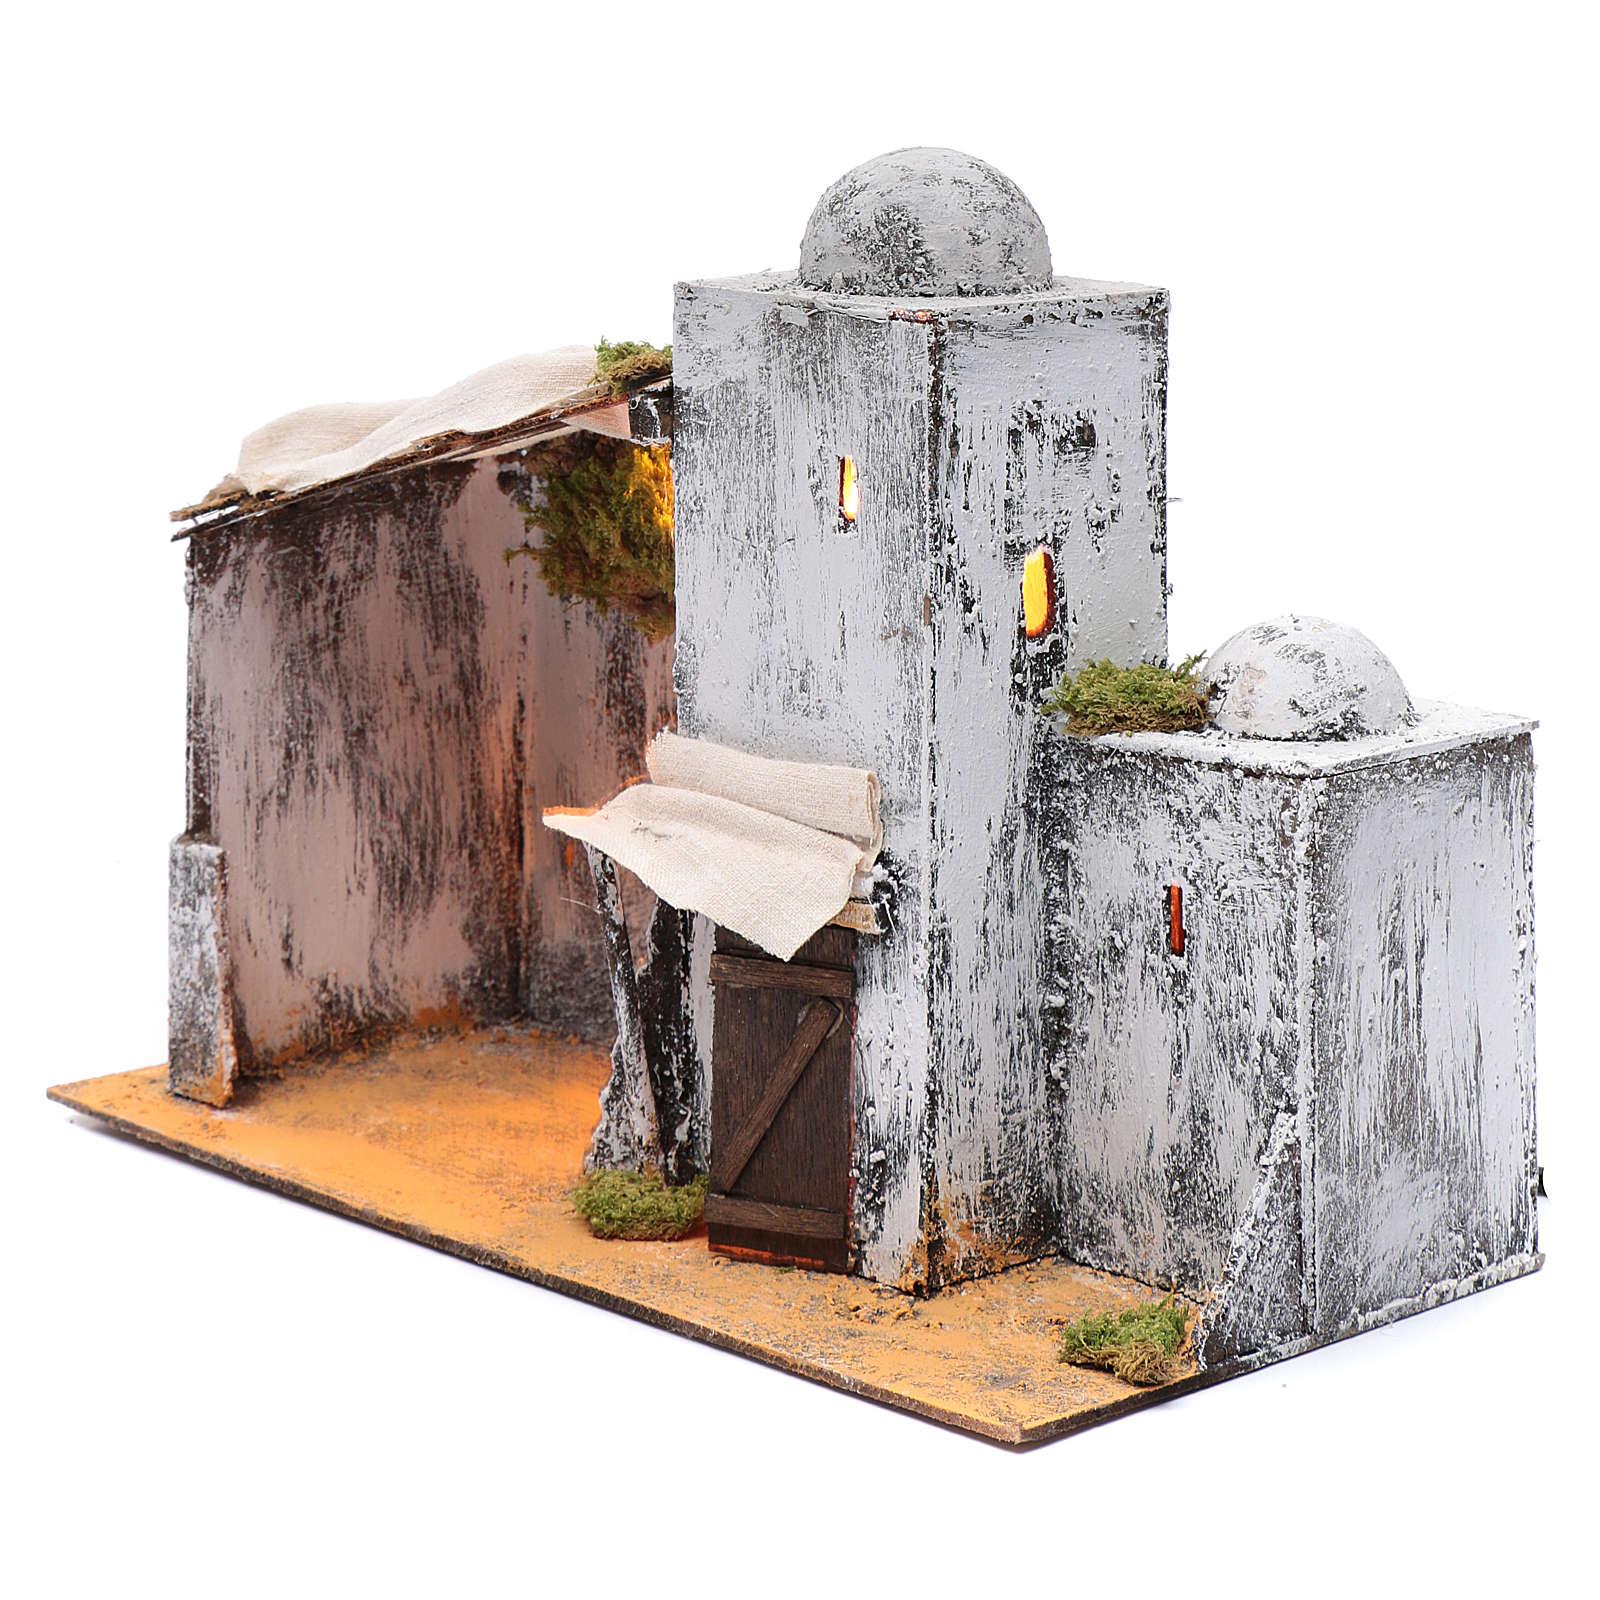 Neapolitan nativity scene setting Arabian hut 30x35x20 cm 4